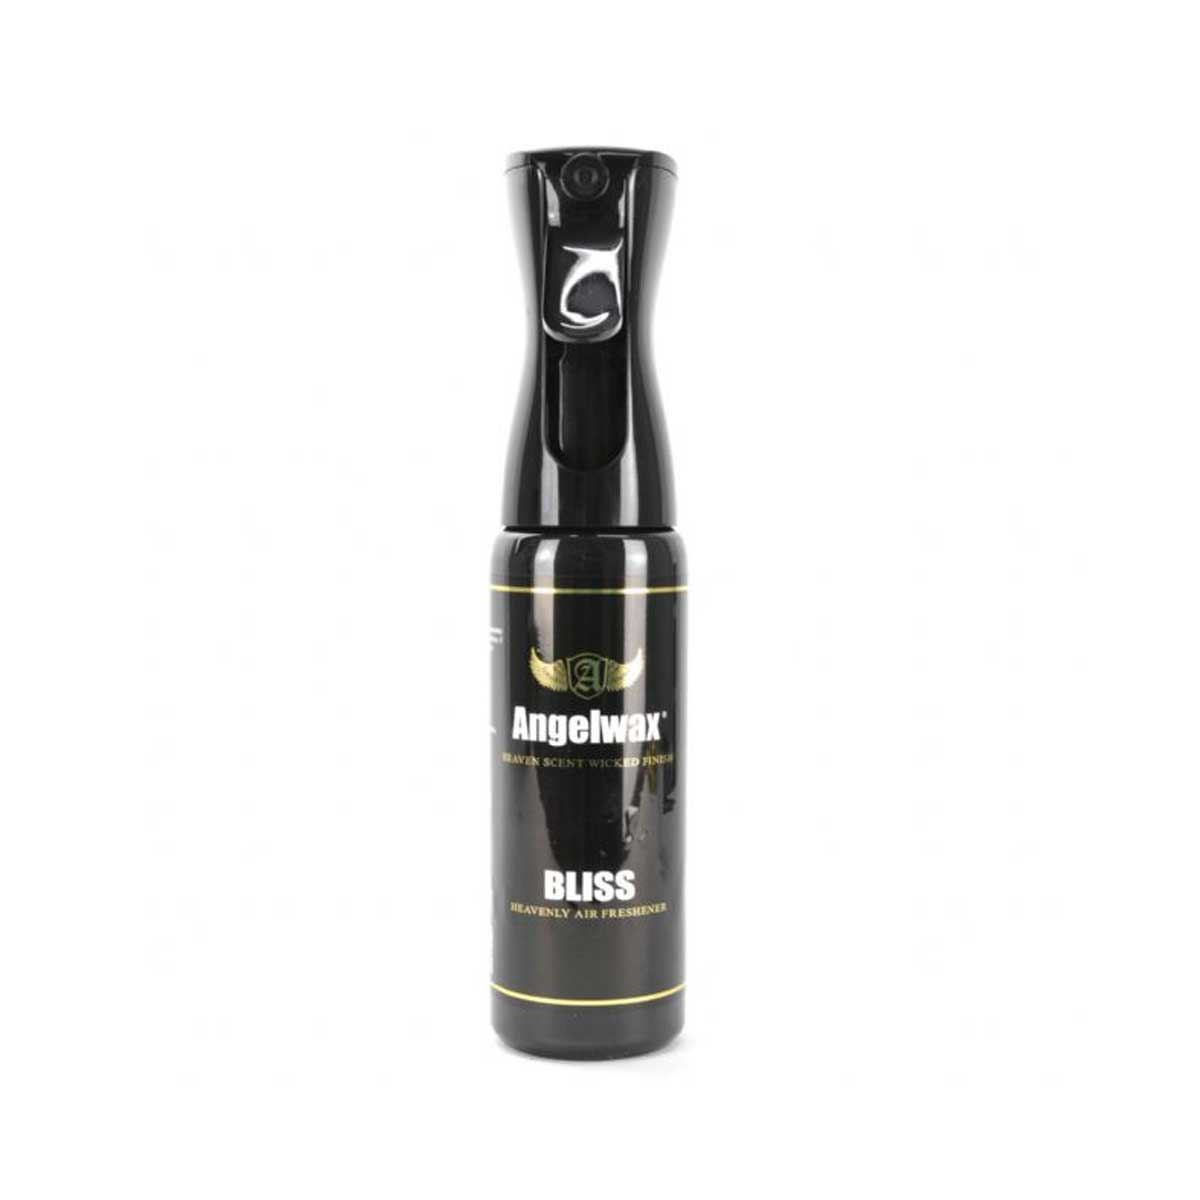 Luktborttagare Angelwax Bliss, 250 ml